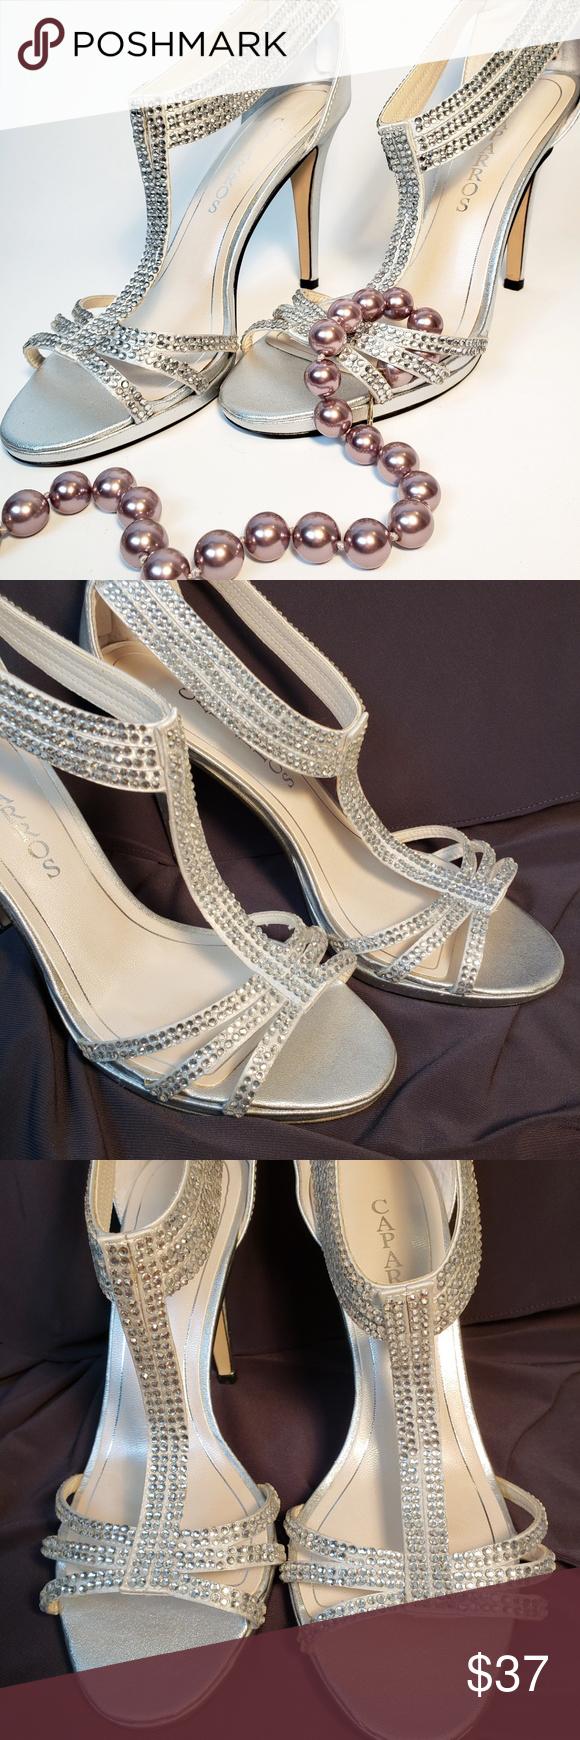 fb8361cb087b Caparros jeweled silver strappy heels